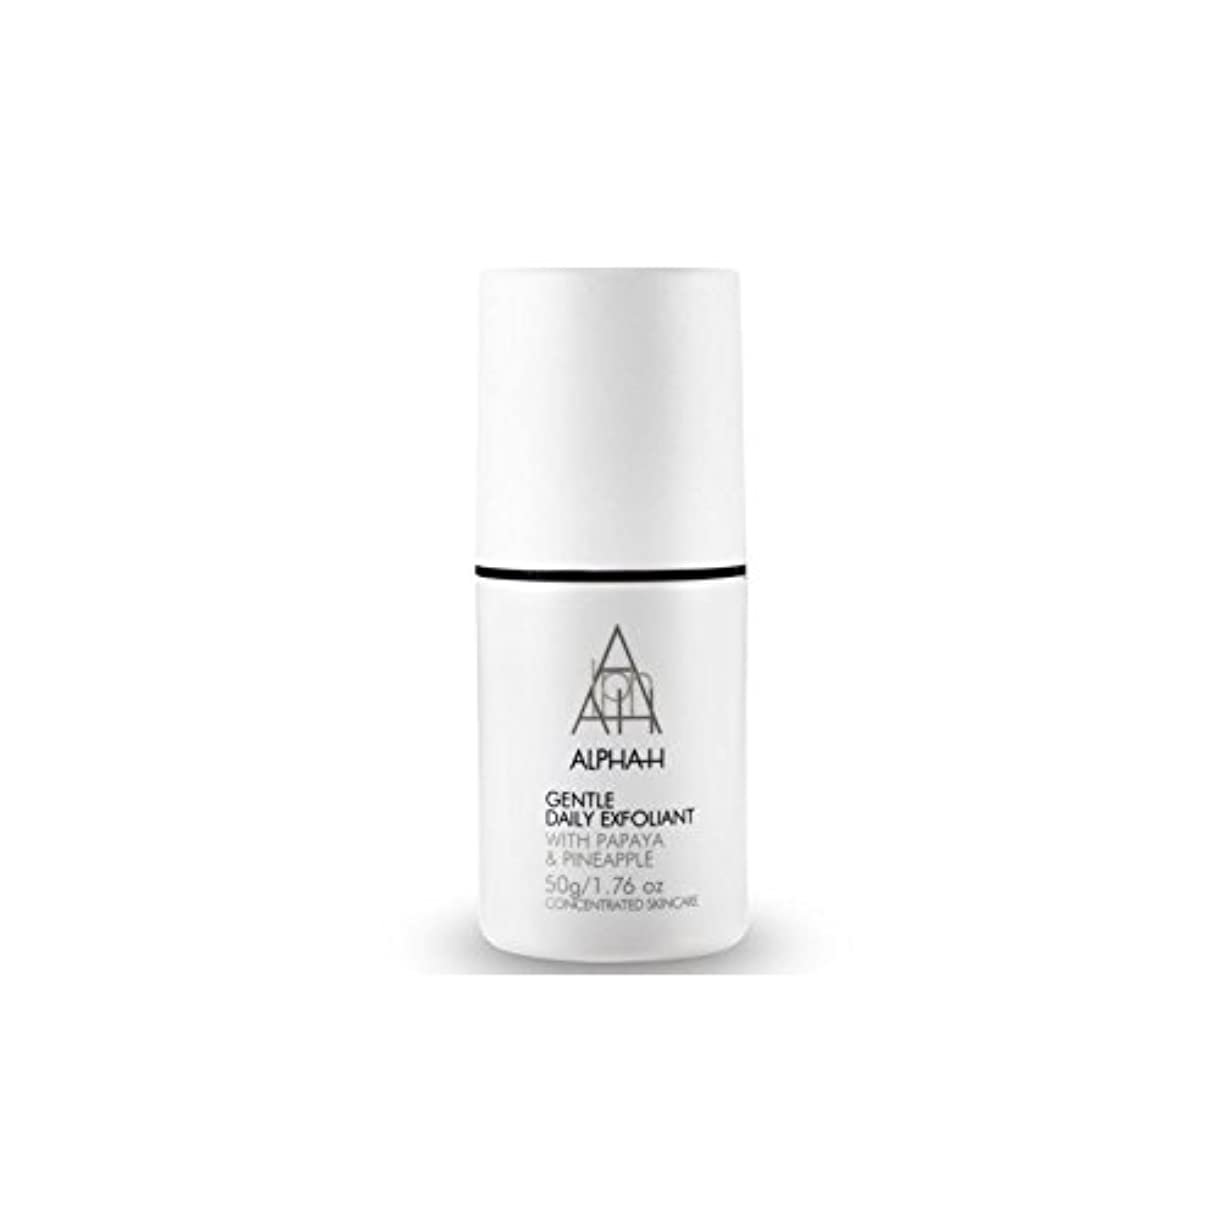 Alpha-H Gentle Daily Exfoliant (50G) - アルファ - 時間穏やか毎日の角質(50グラム) [並行輸入品]